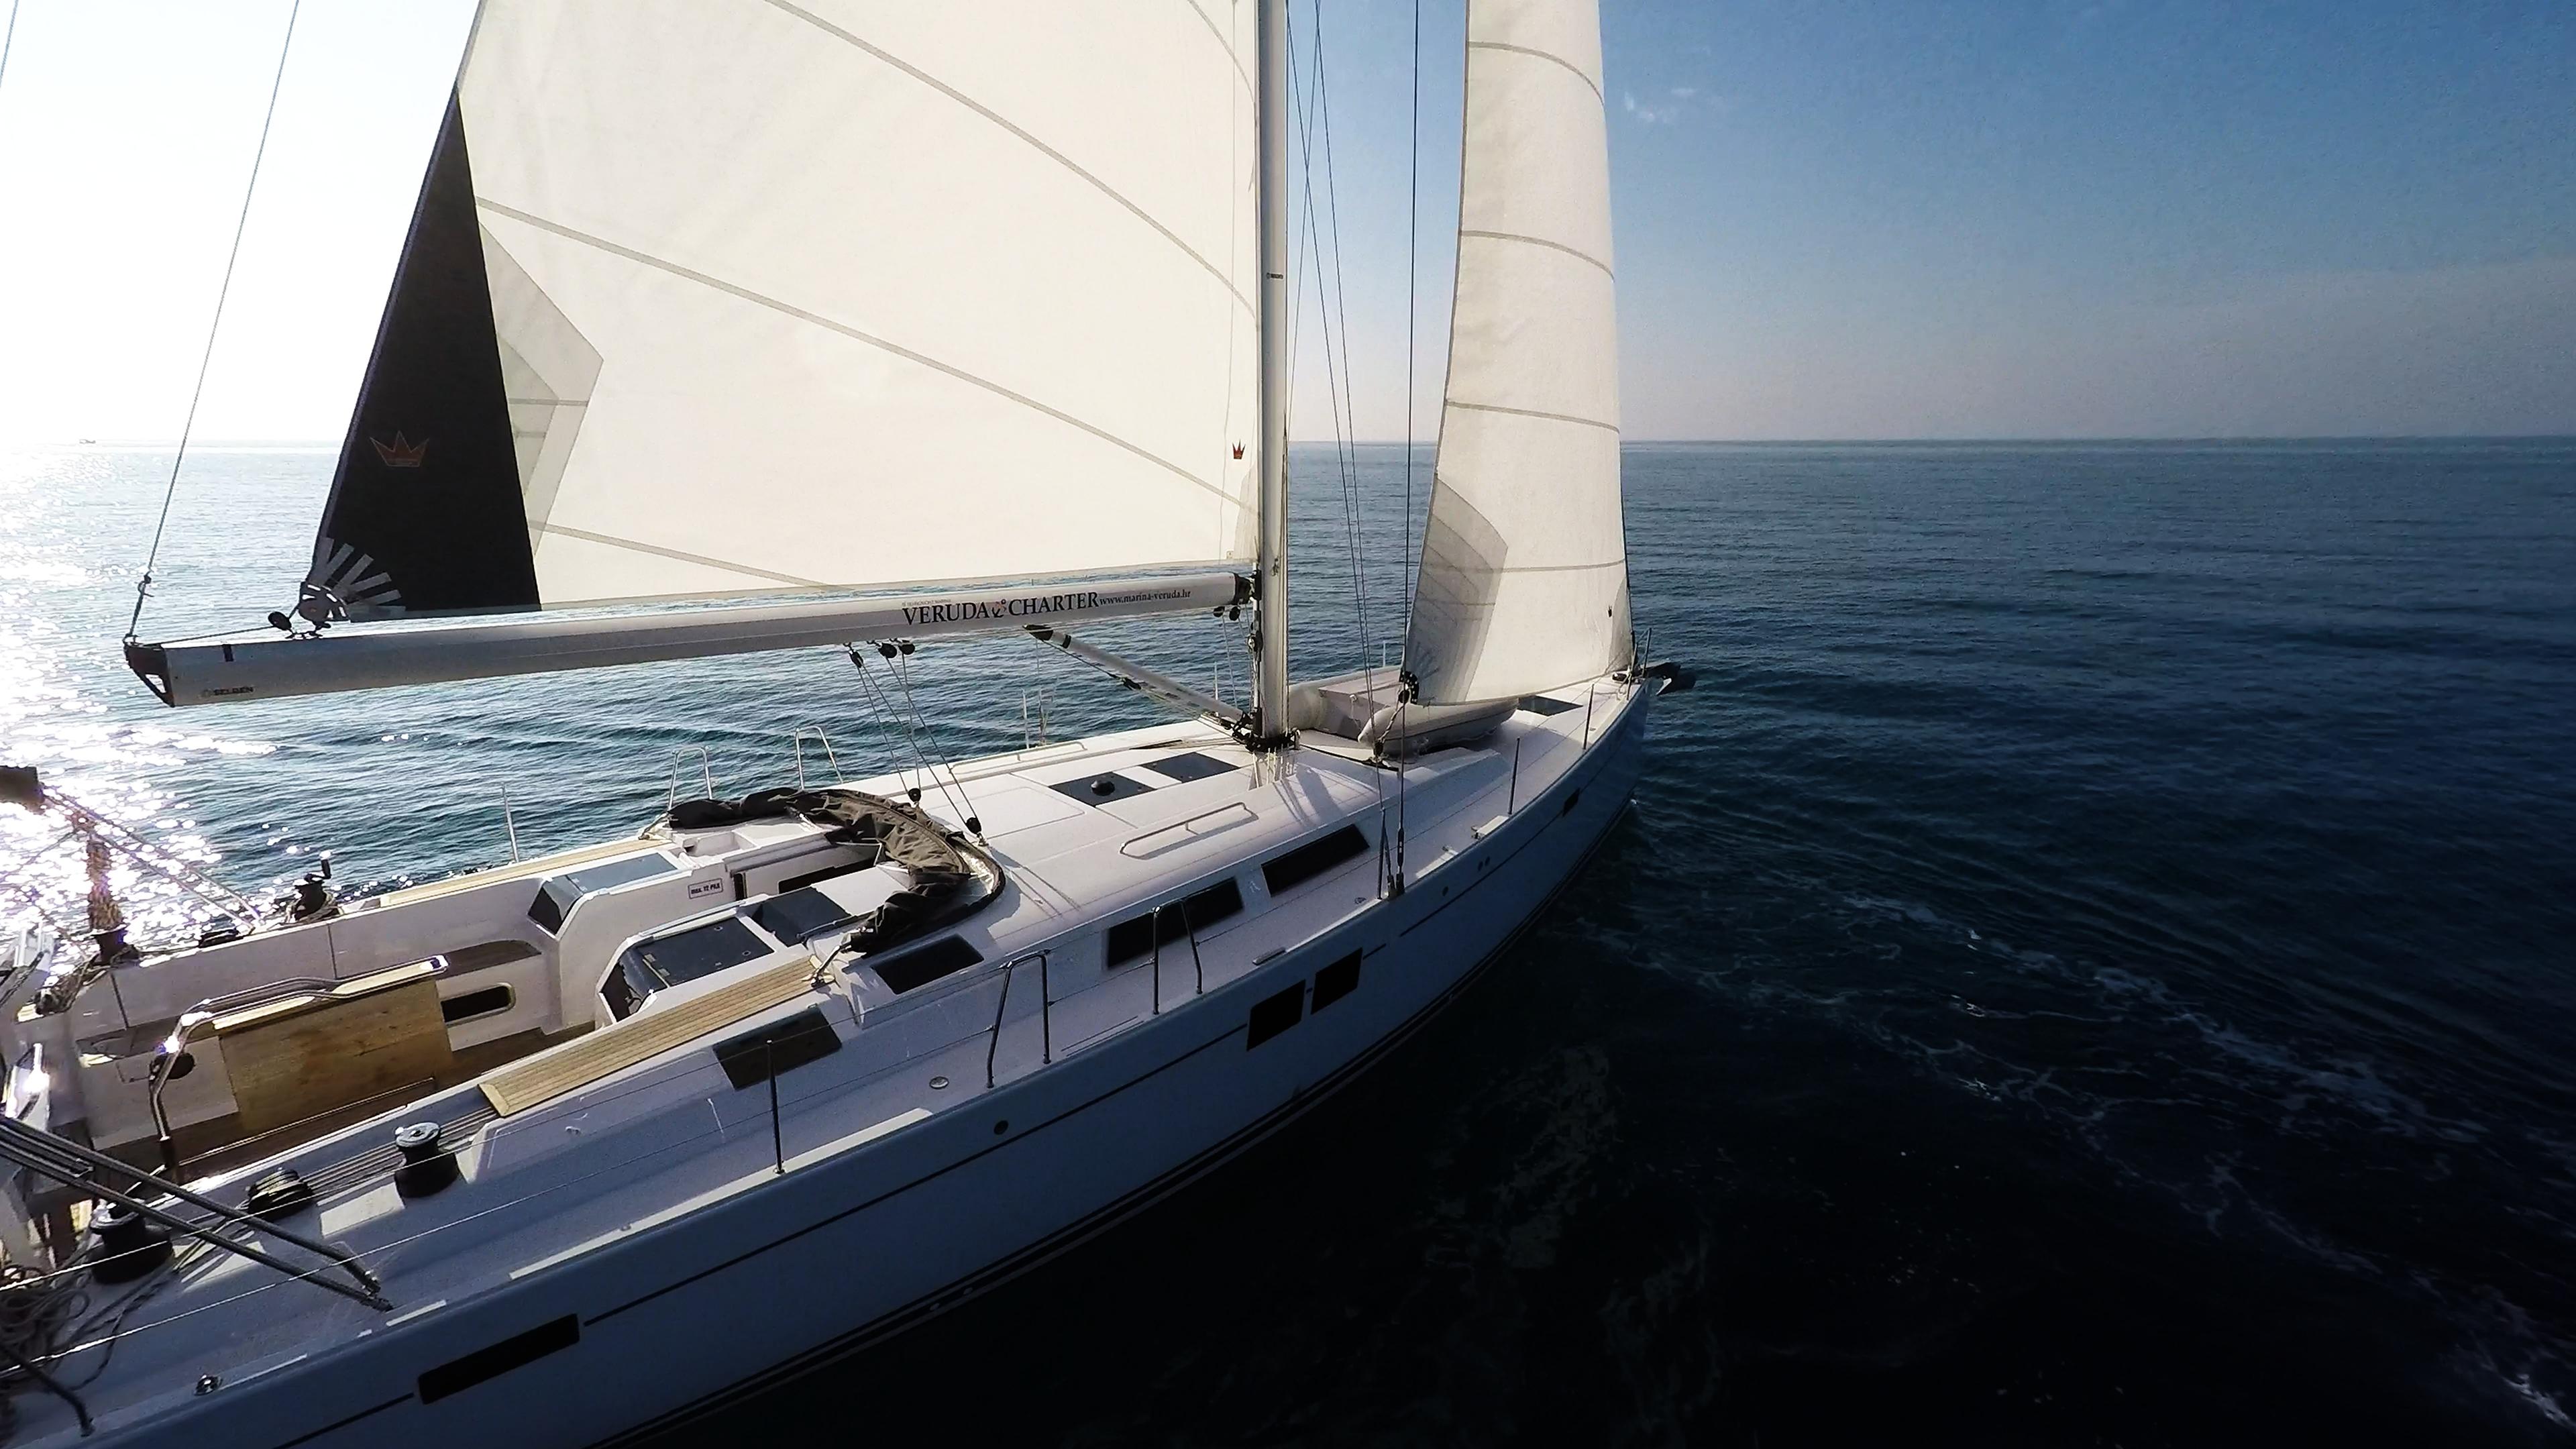 sailing yacht sea sails sun sailboat sailing yacht bow